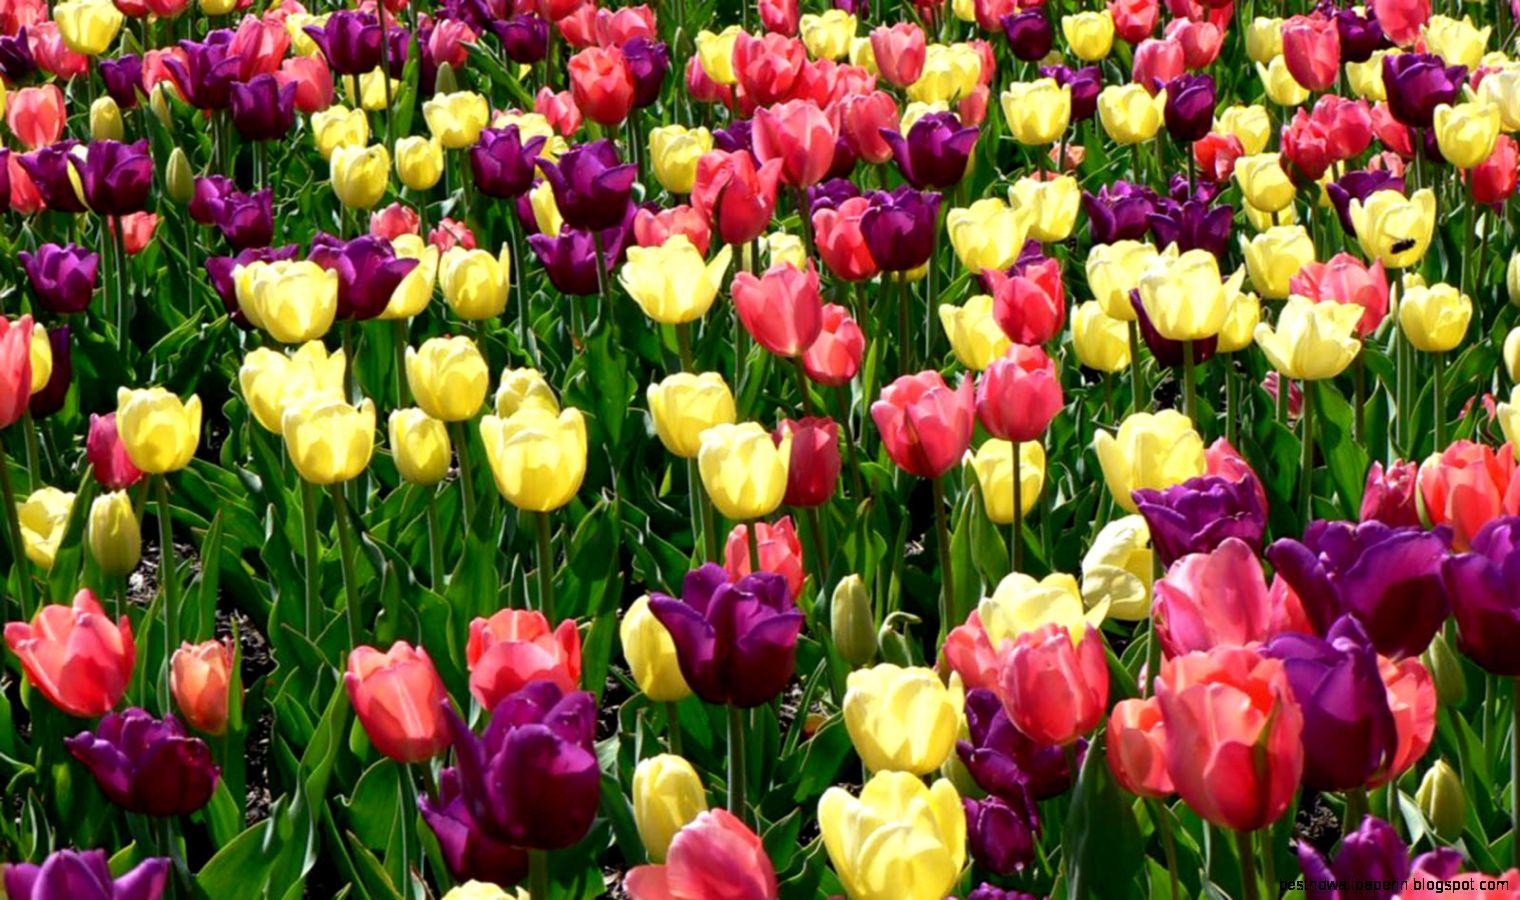 Spring Desktop Wallpaper Widescreen | Best HD Wallpapers